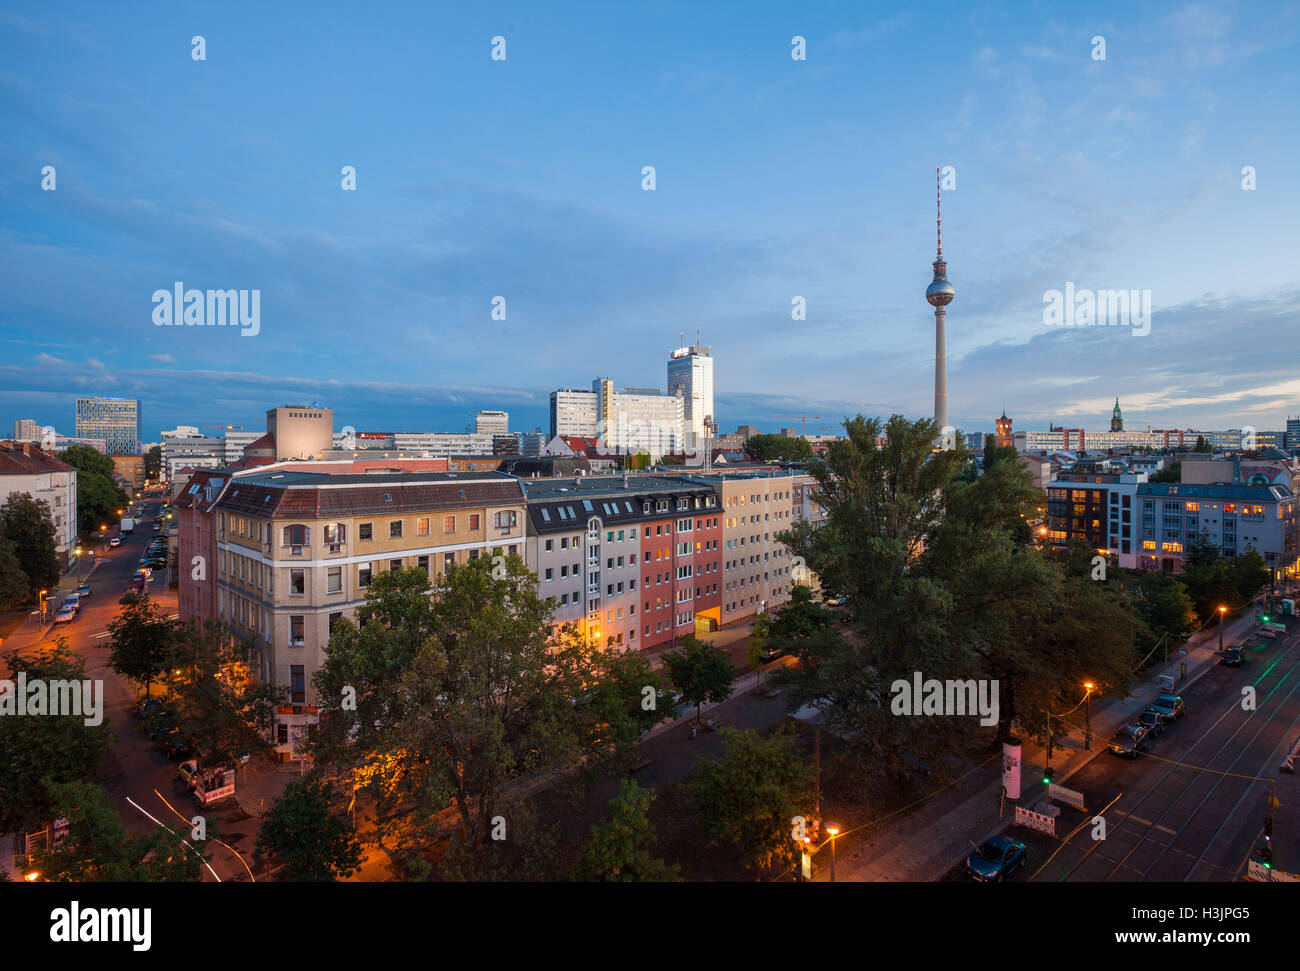 BERLIN - October 2, 2016: Berlin's Alexanderplatz and Fernsehturm (TV Tower) on October 2, 2016. Stock Photo